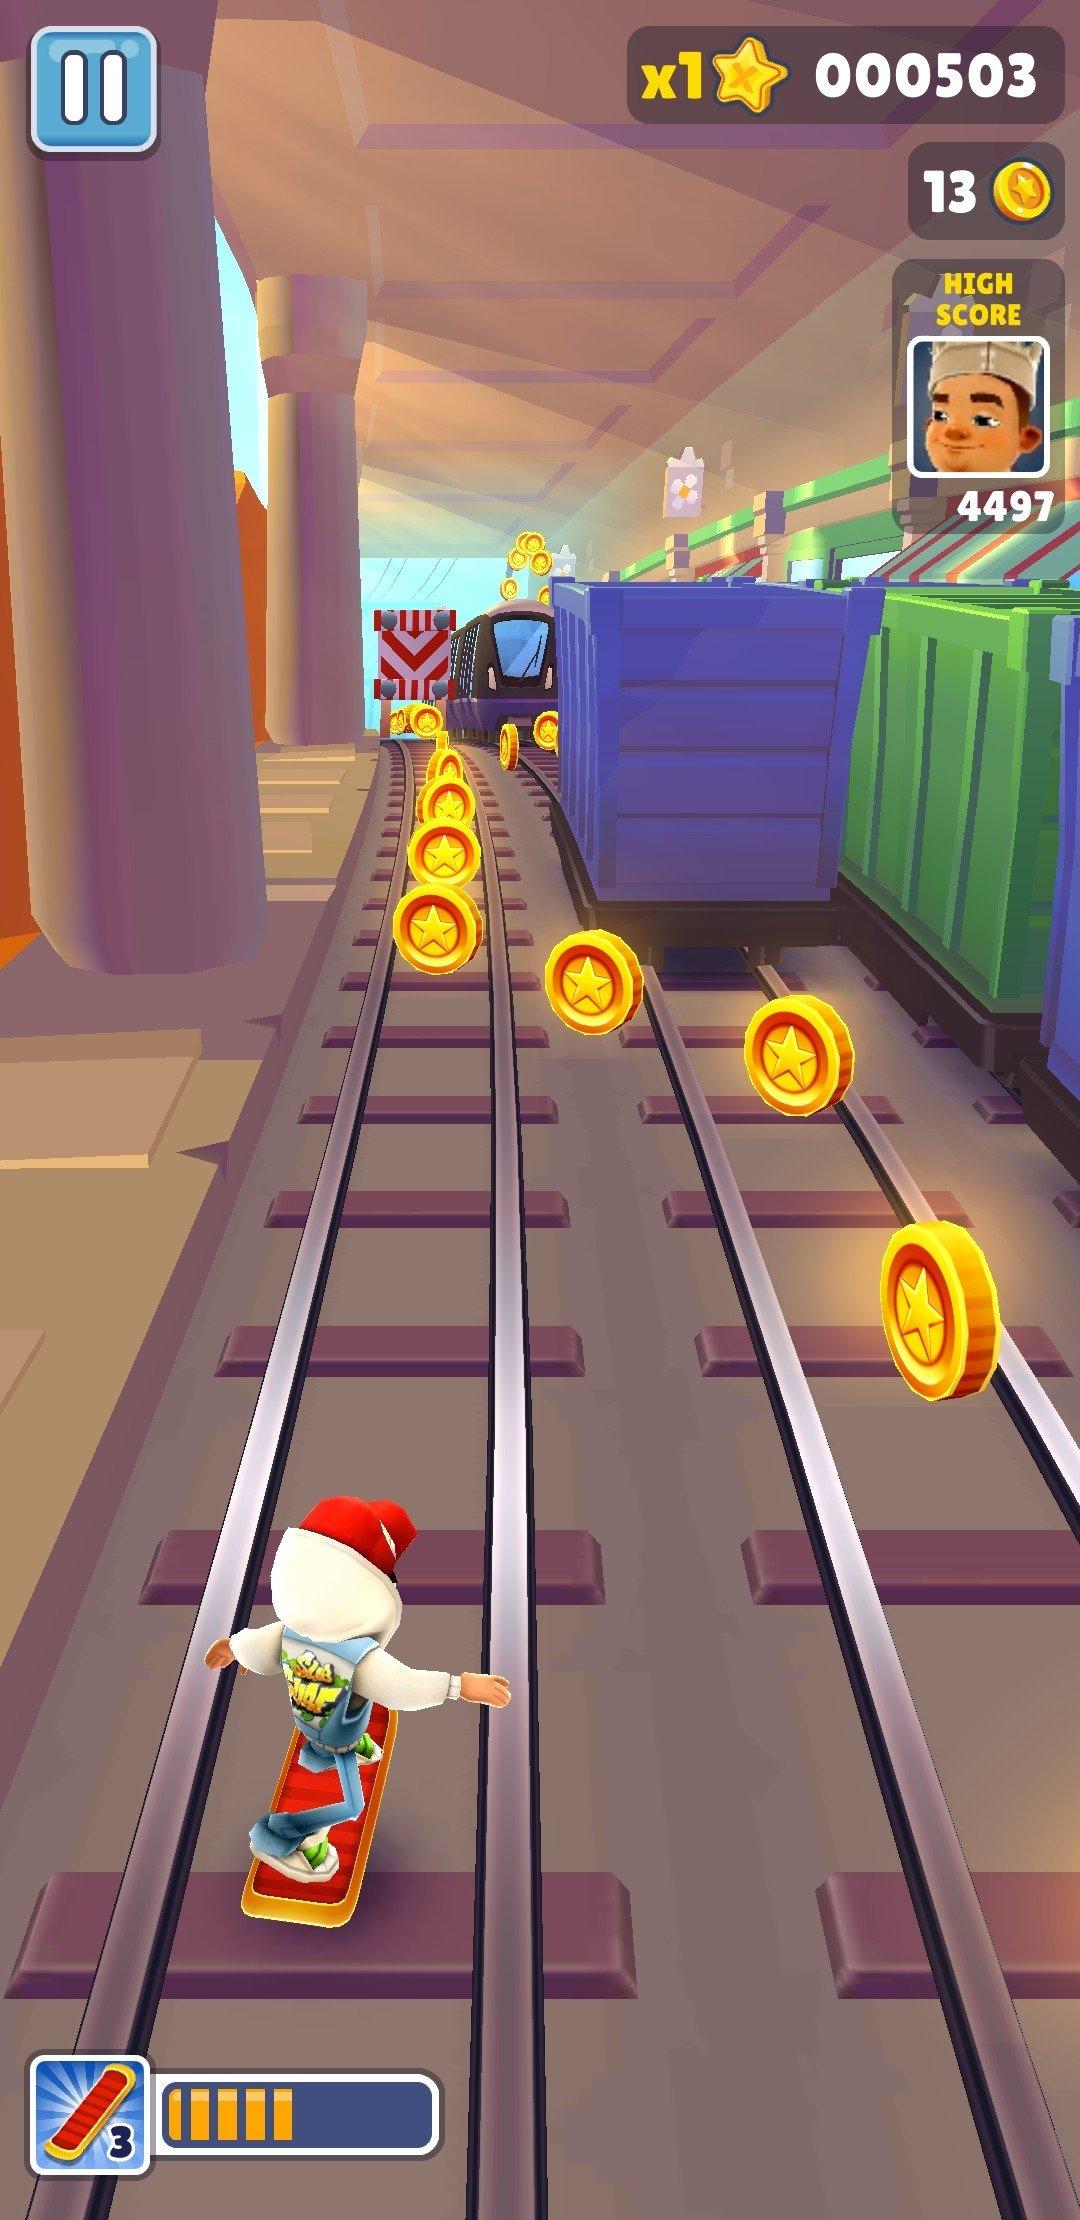 Игра Subway Surfers Токійо Скачать На Андроид